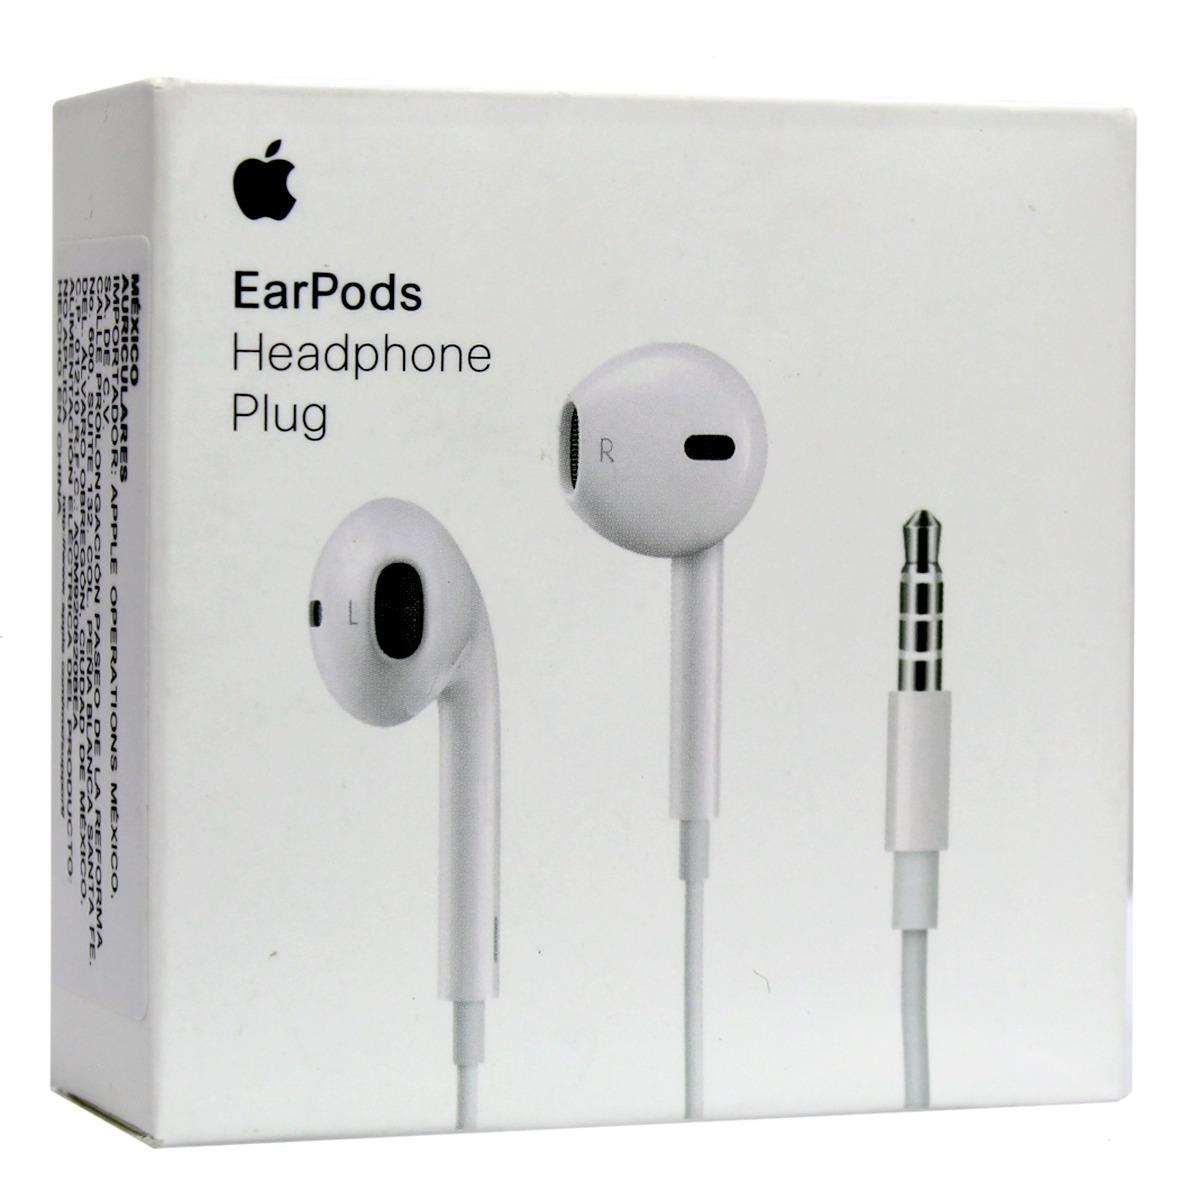 655f889d7d4 Apple Earpods Con Jack De 3.5mm - $ 320.00 en Mercado Libre